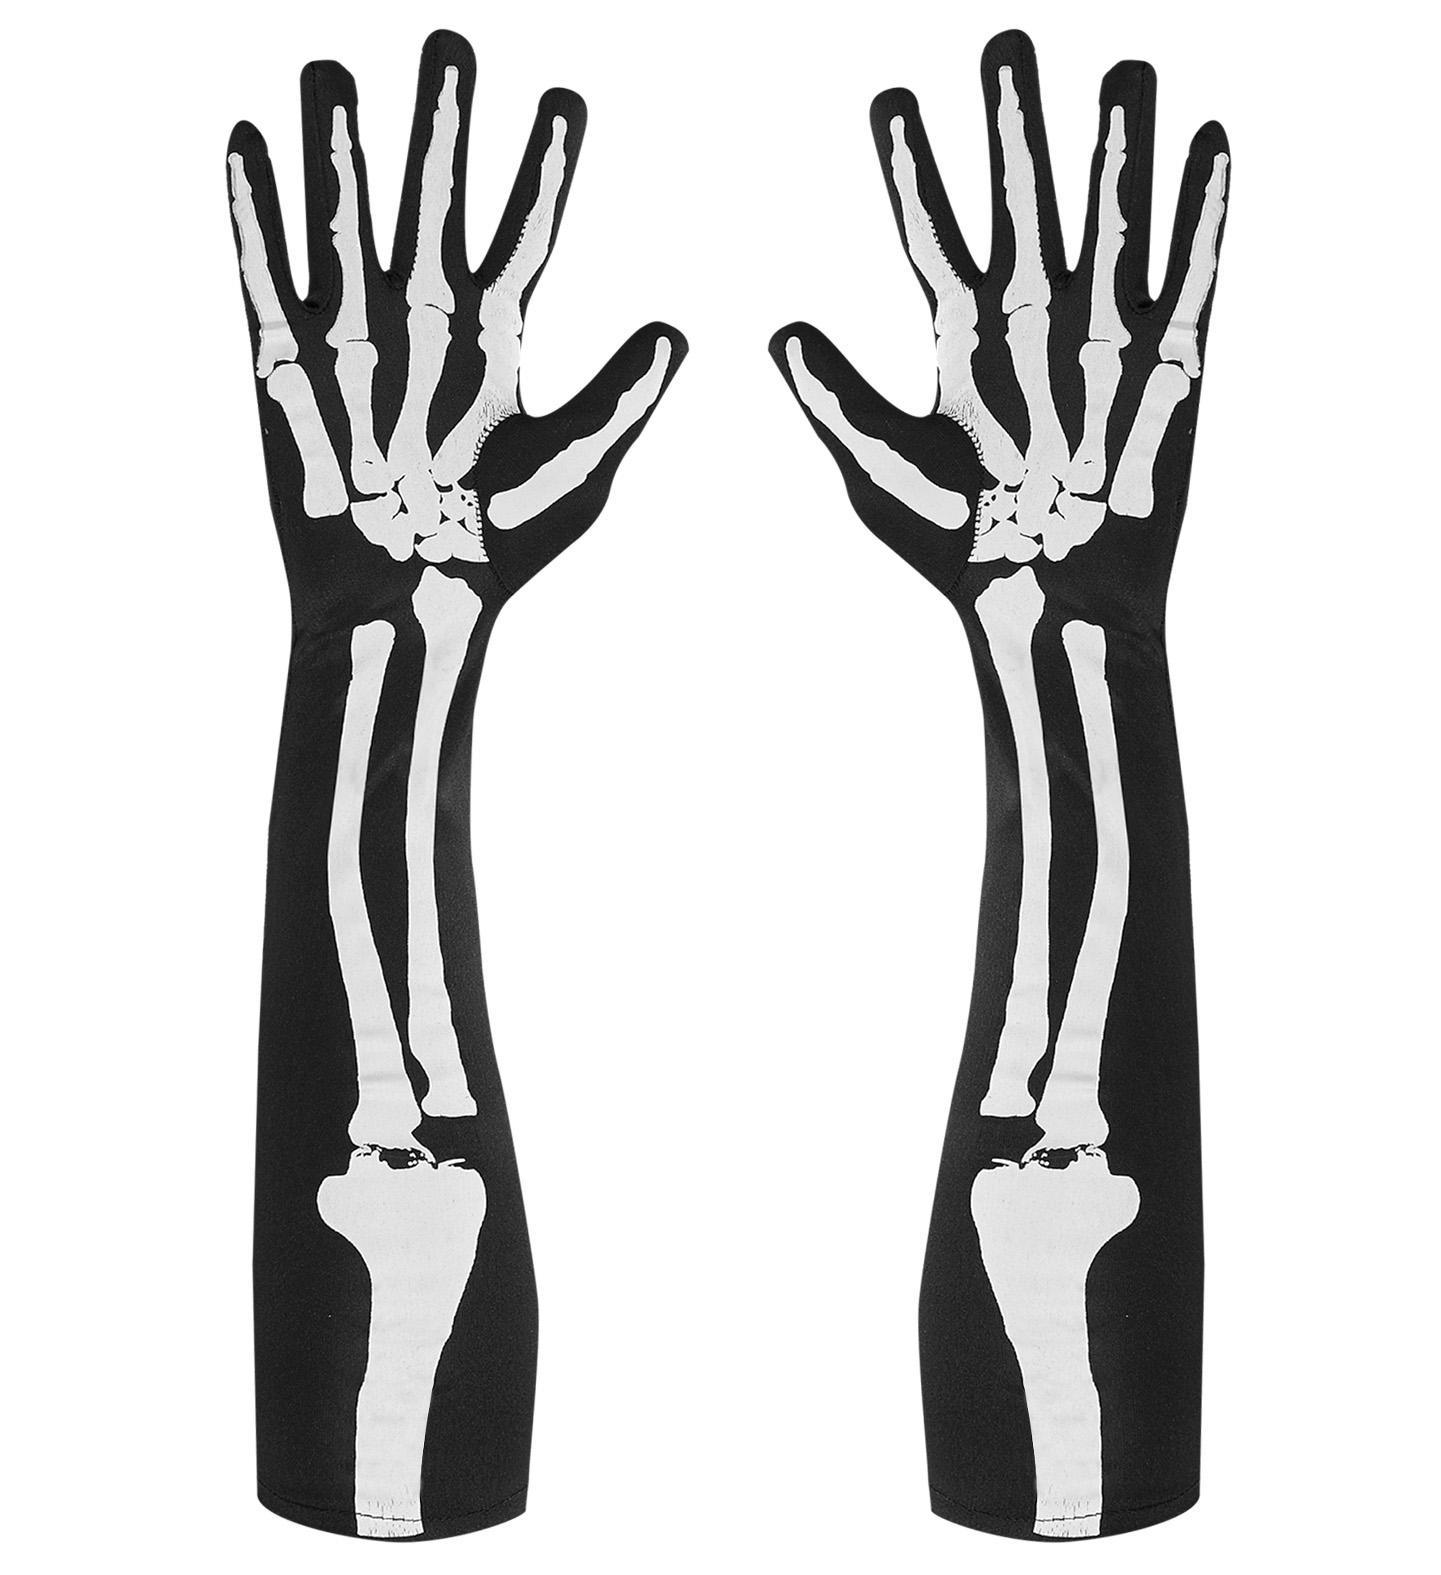 Fantastisch Knochen In Arm Ideen - Anatomie Ideen - finotti.info